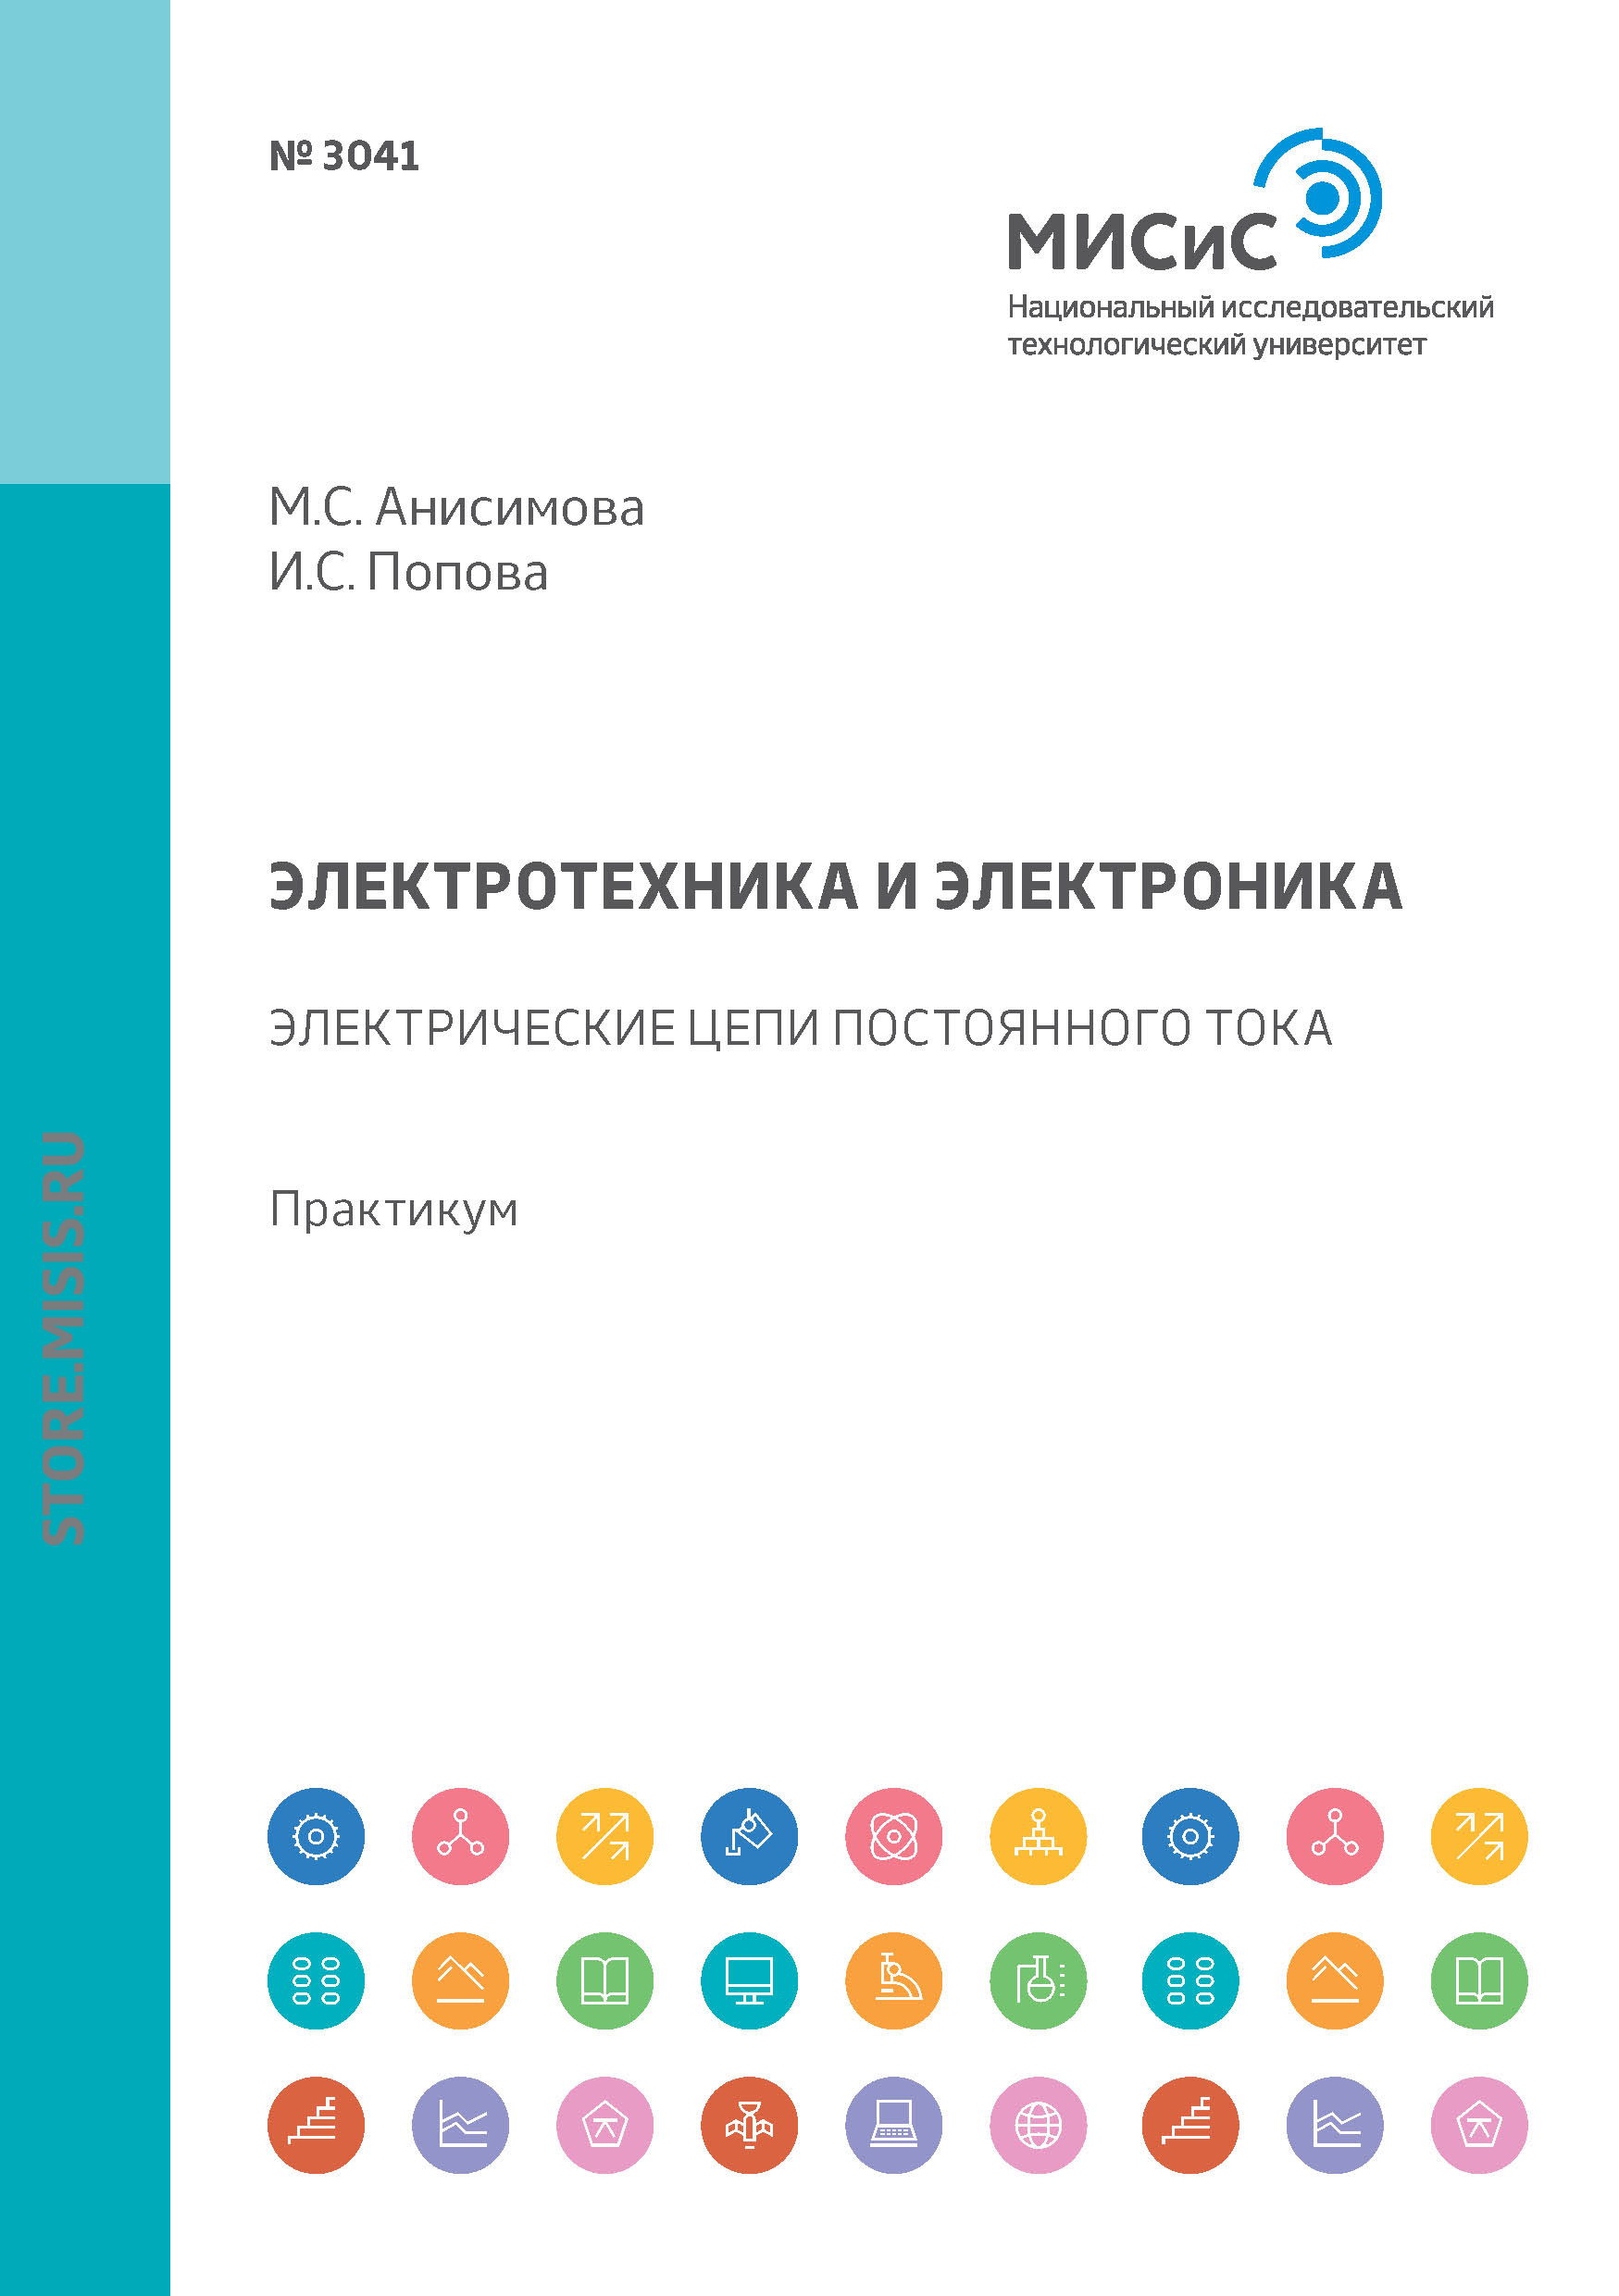 цена на М. С. Анисимова Электротехника и электроника. Электрические цепи постоянного тока. Практикум